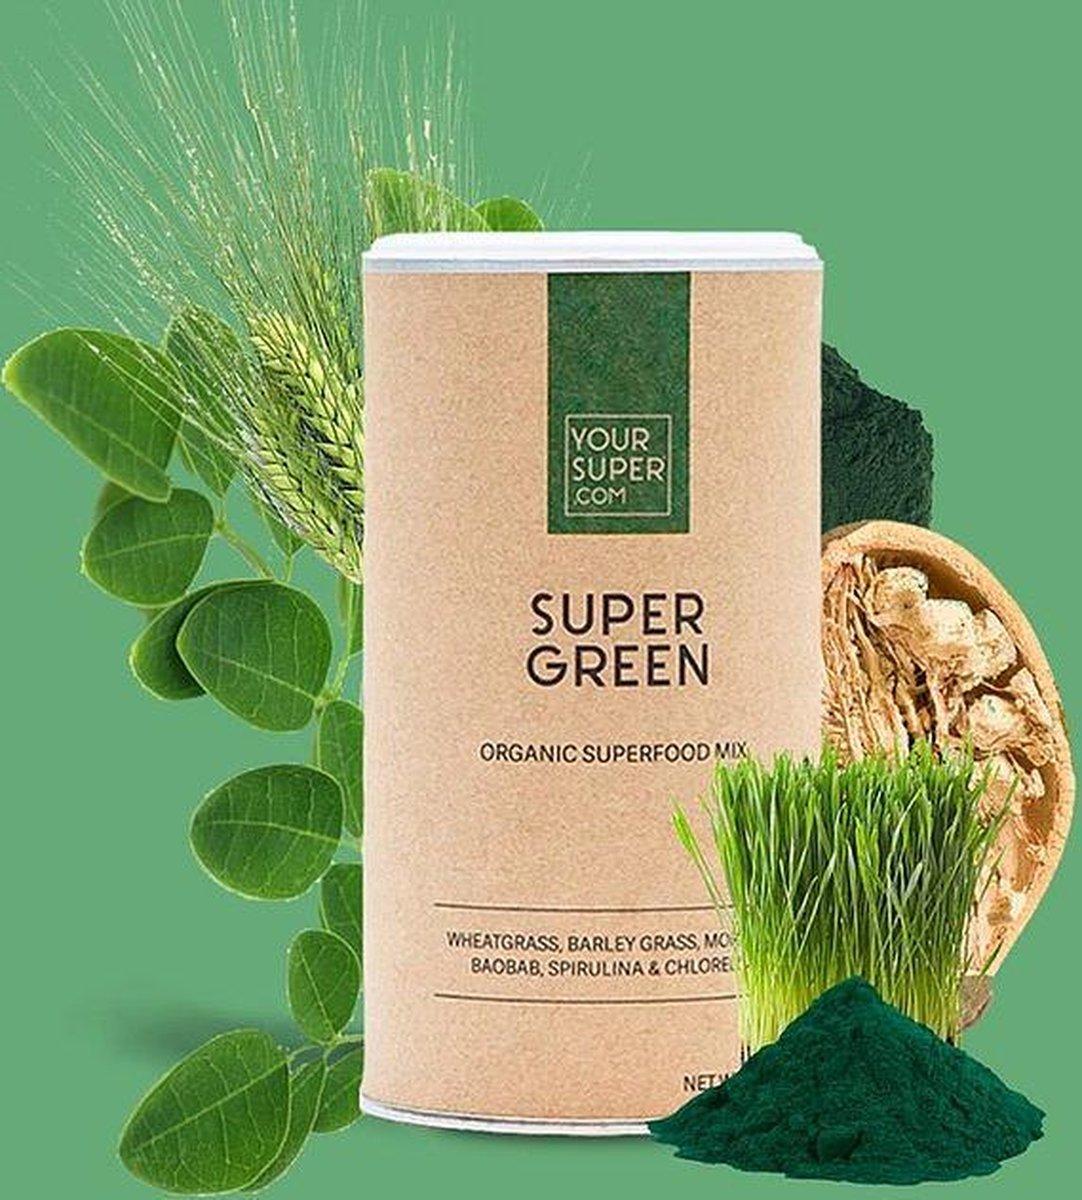 Your Super - SUPER GREEN - Organic Superfood Mix - Plantaardig - Boost immuunsysteem - Prebioticum